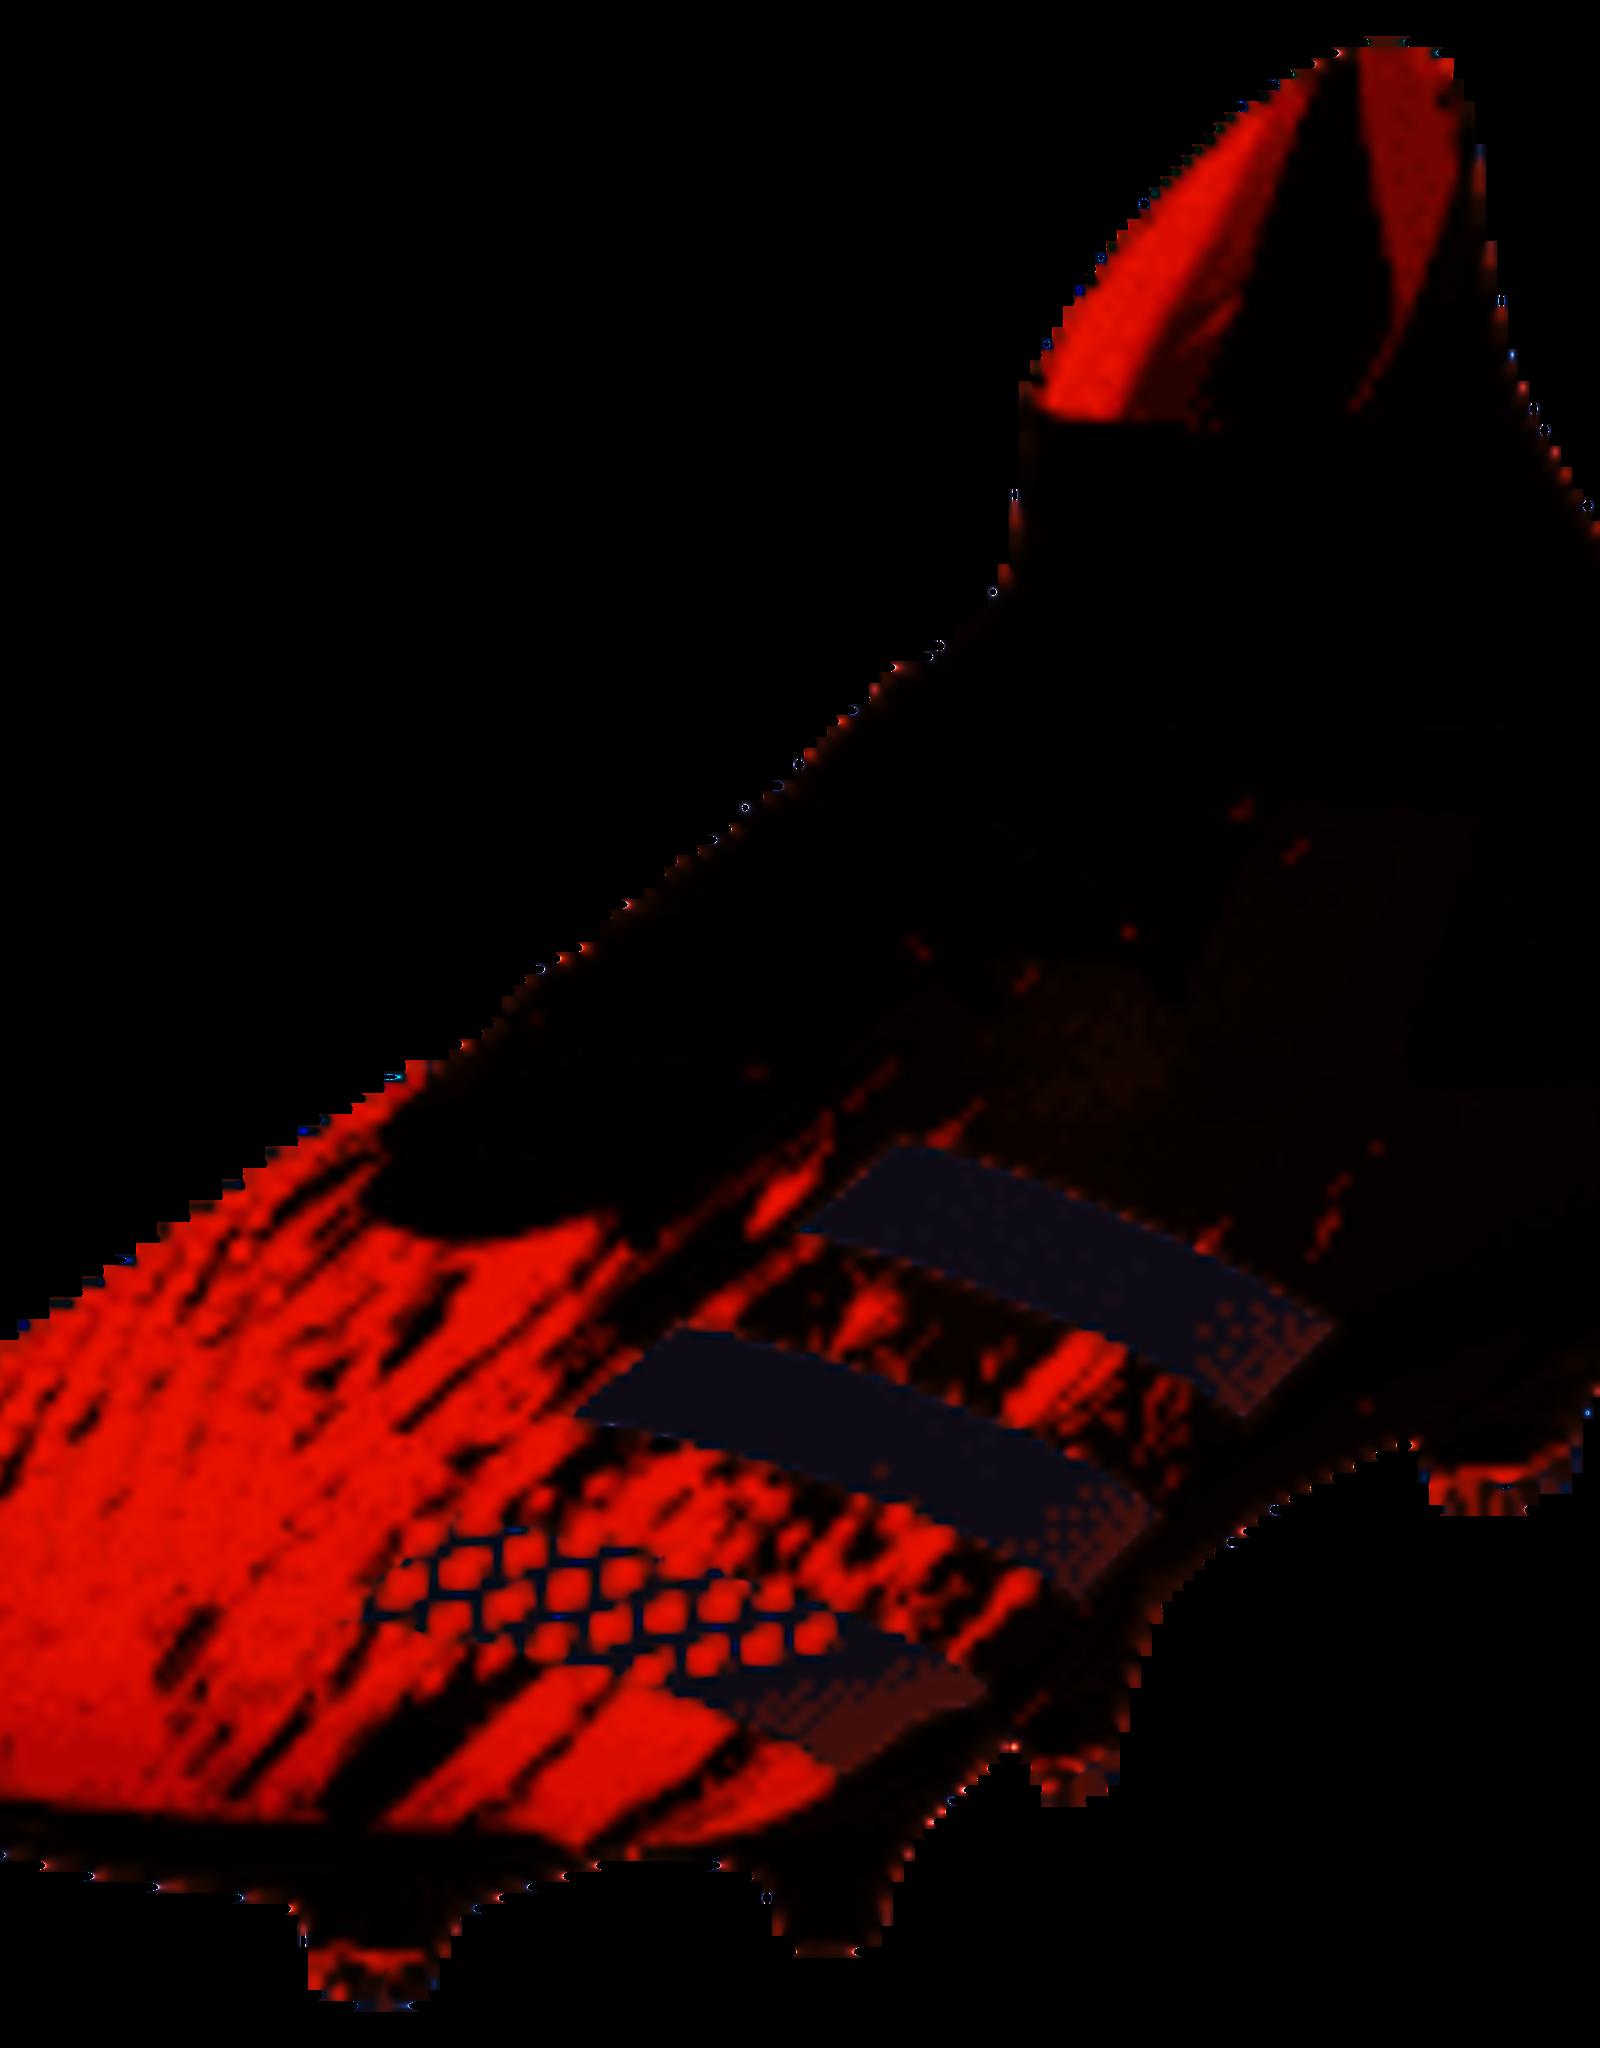 adidas Predator 20.1 FG Firm Ground Soccer Cleat - Black/White/Red Item